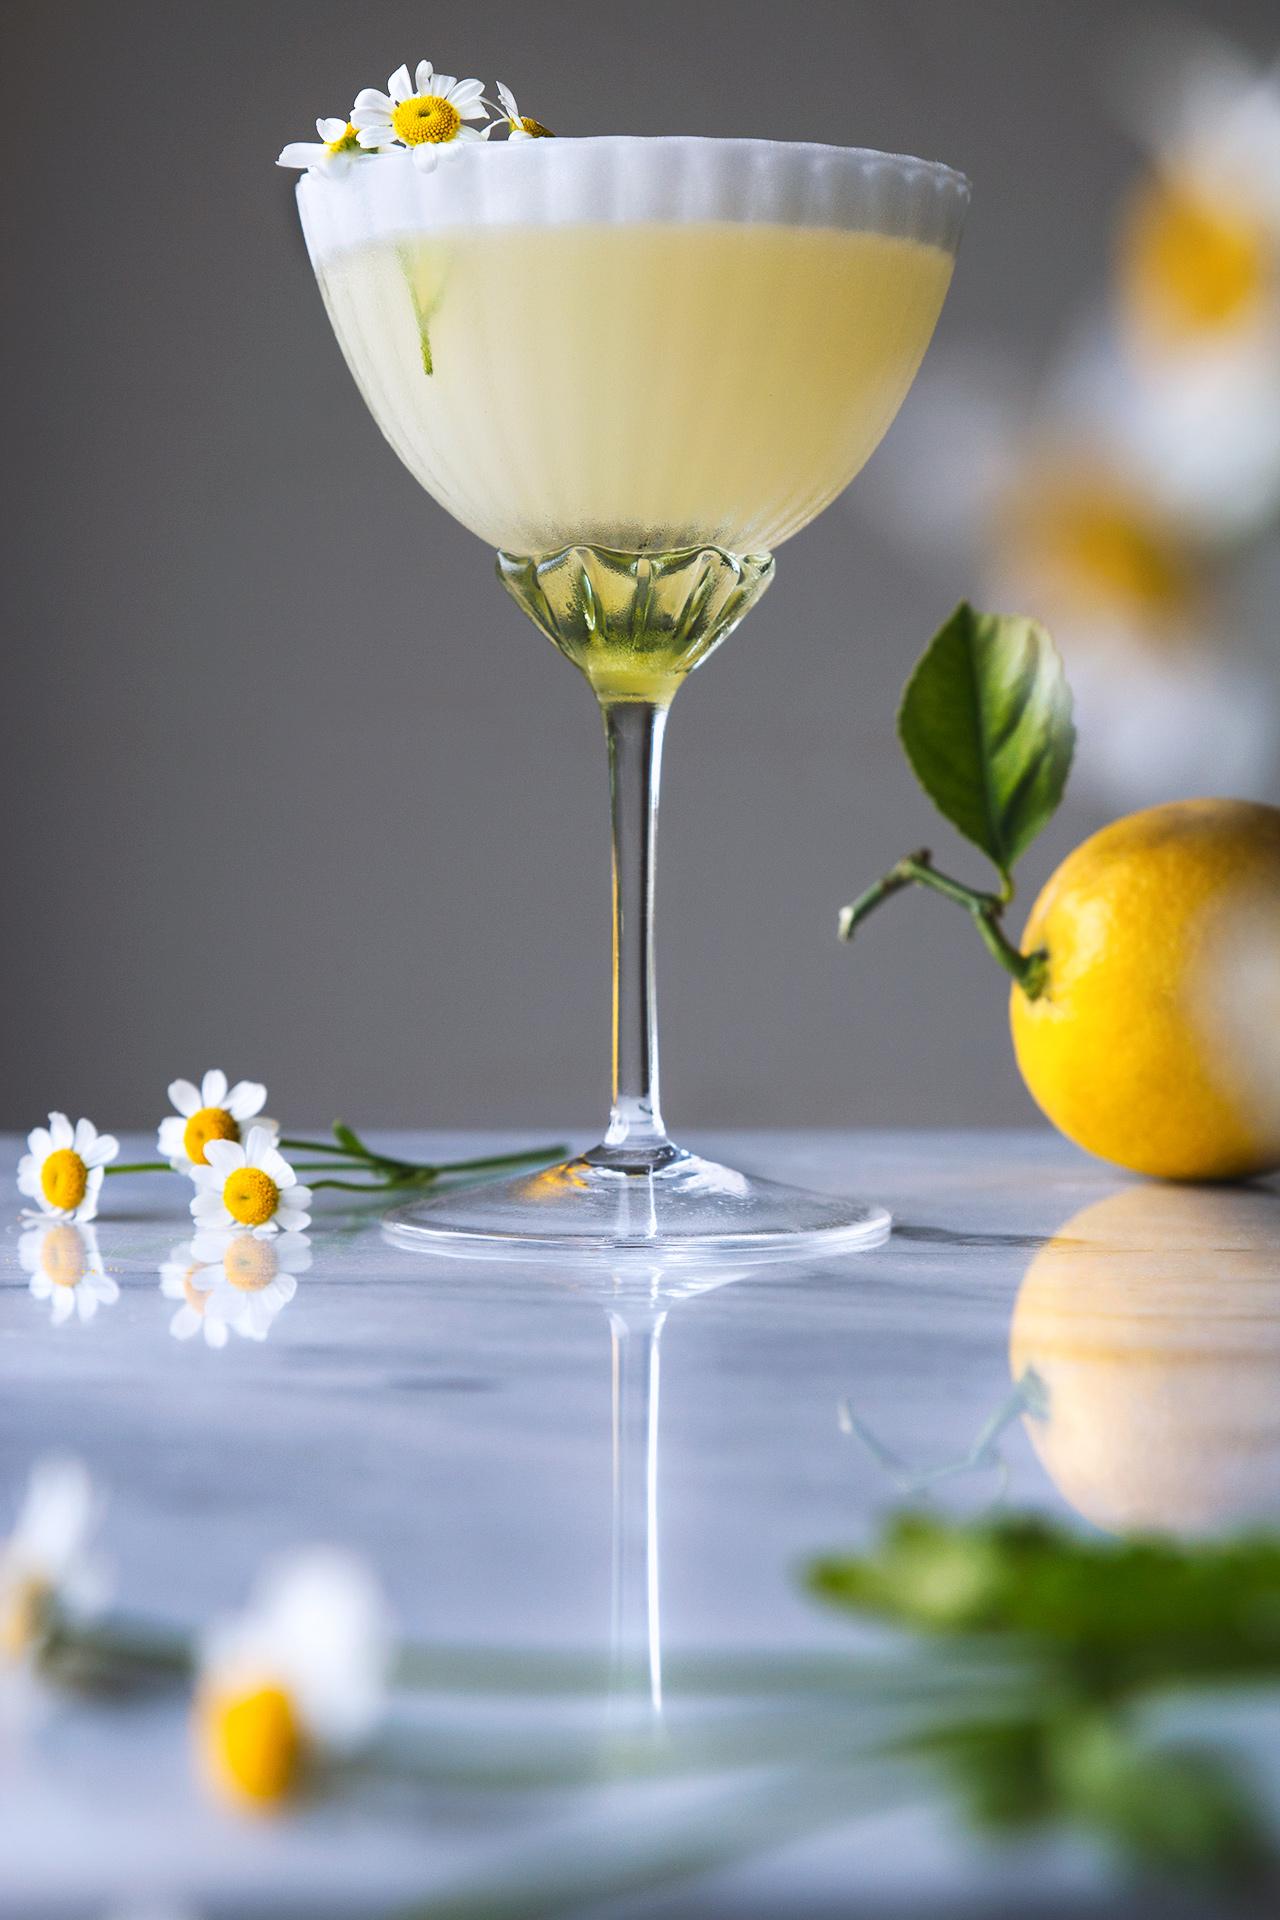 8 Refreshing Spring Cocktails - Lemon Chamomile Spring Cocktail | Honestly Yum